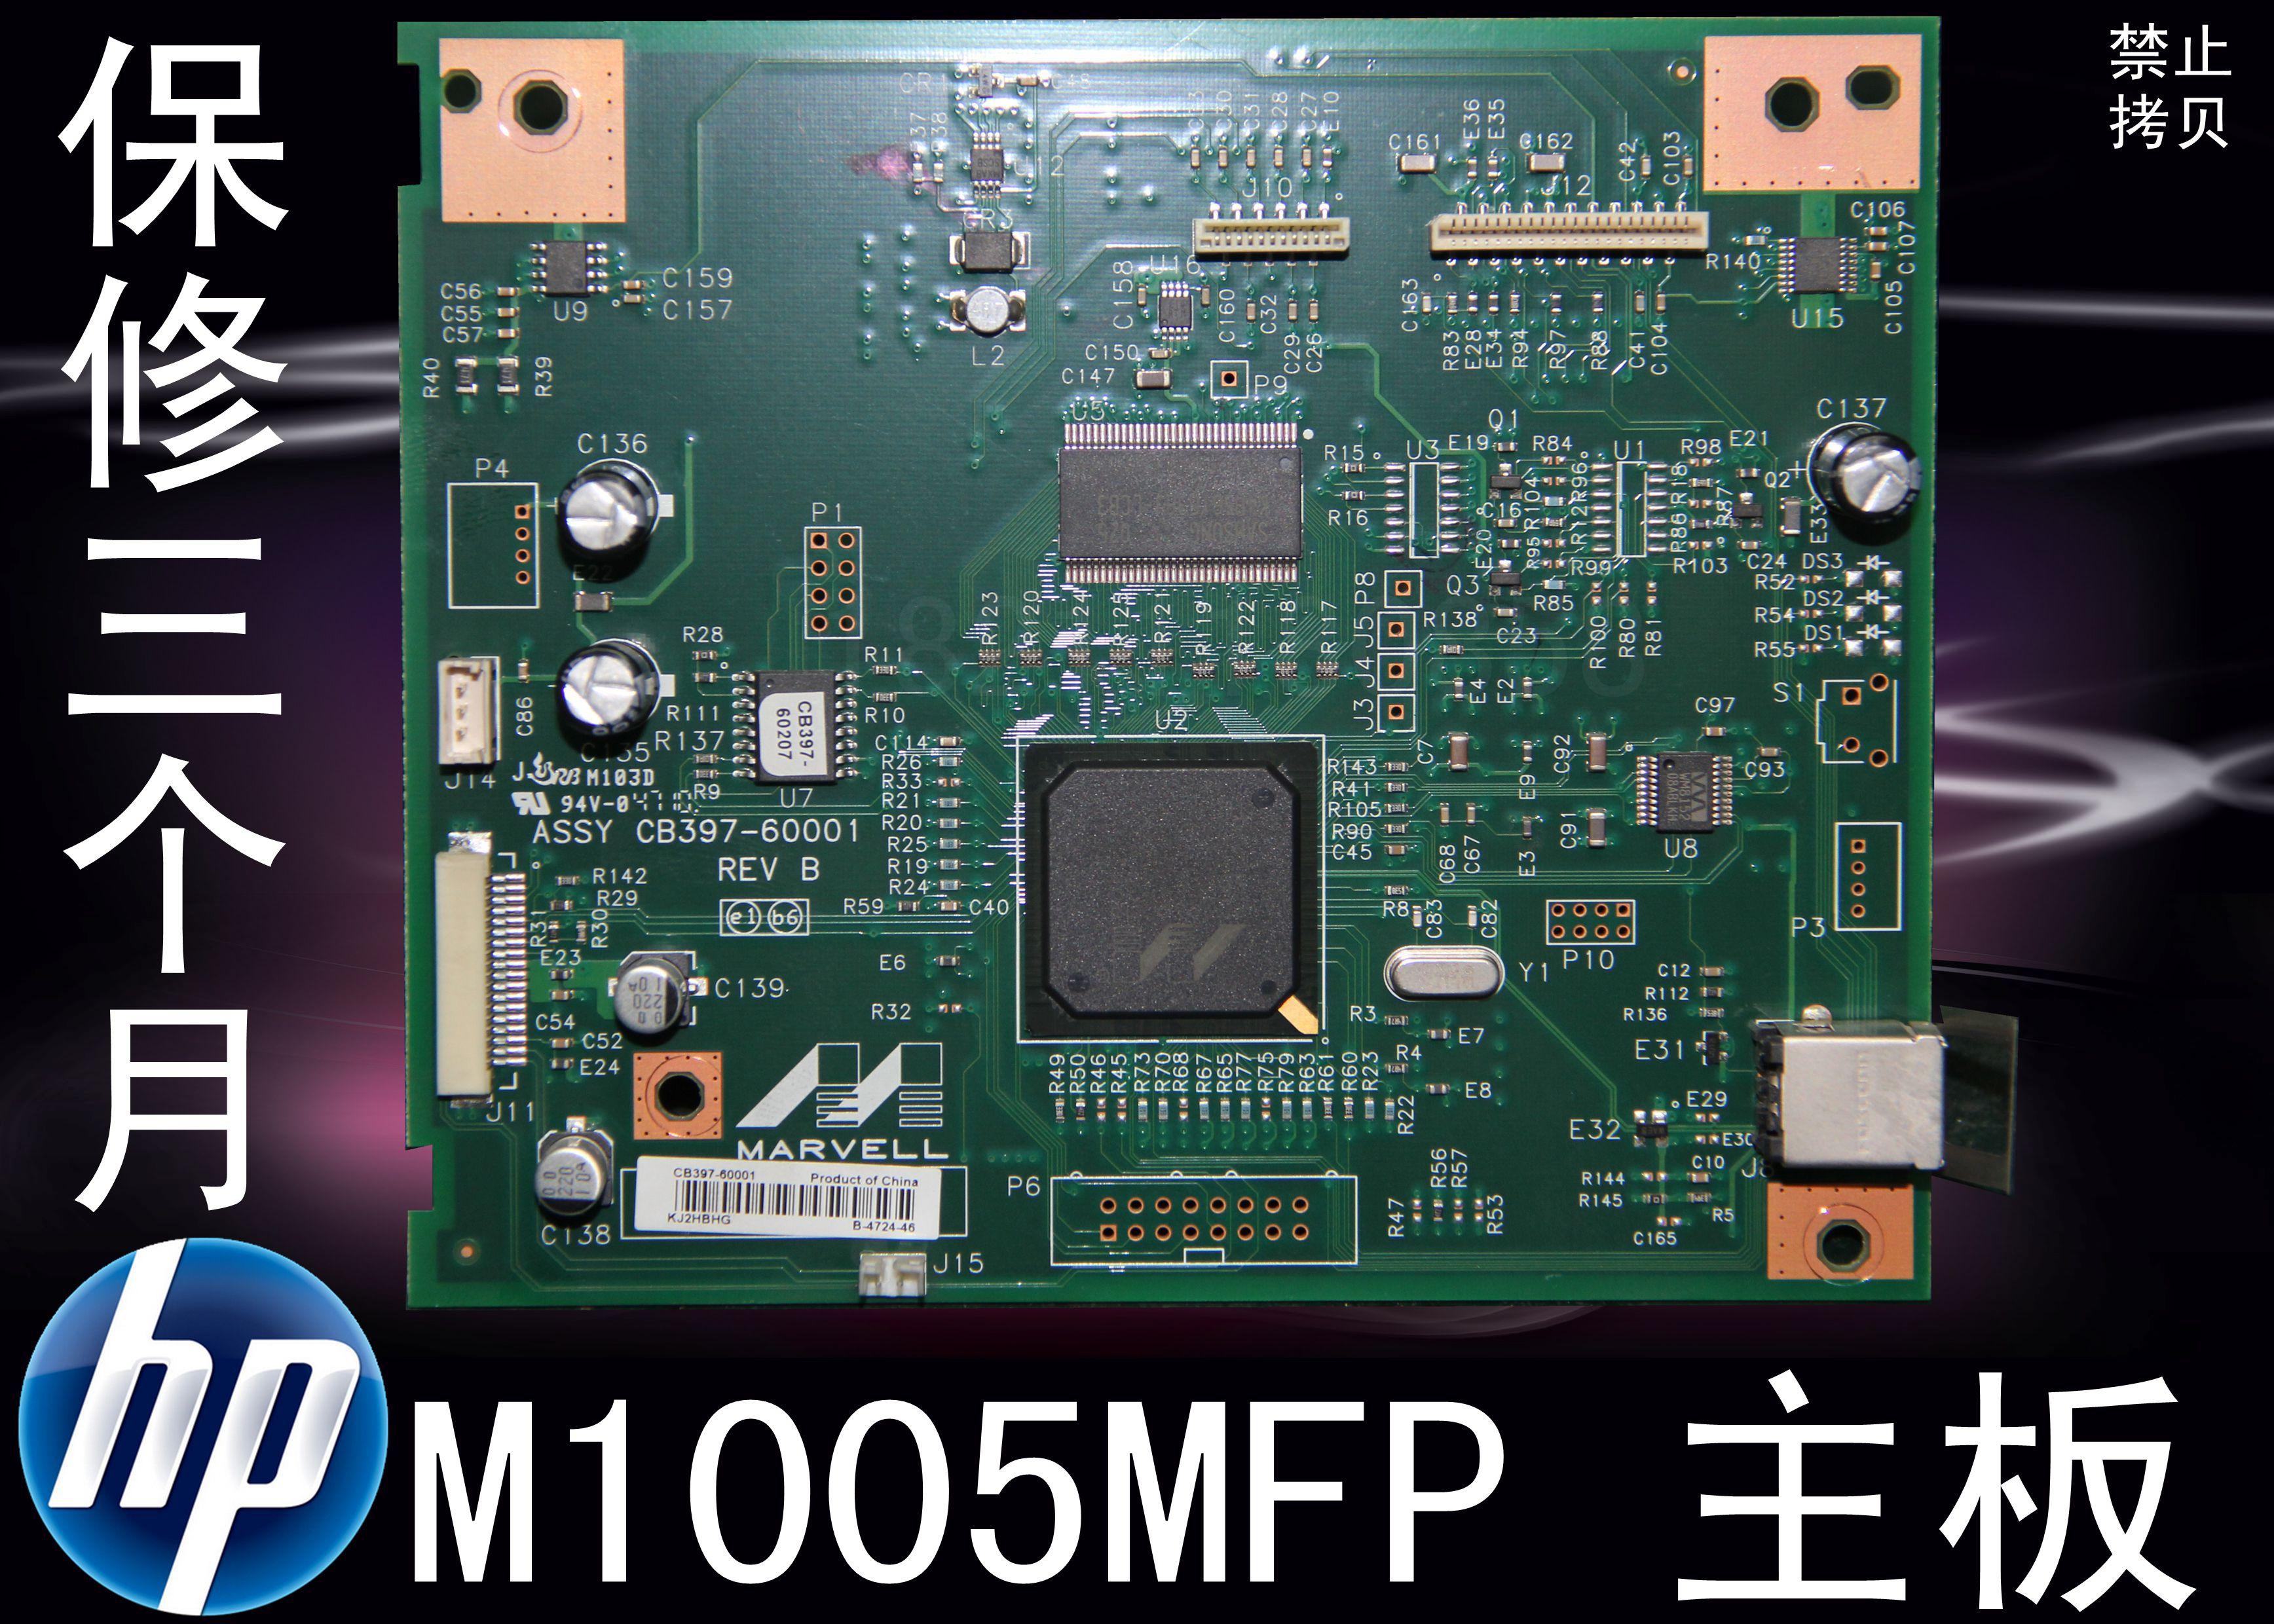 Оригинал HP1005 материнская плата HPM1005 материнская плата интерфейс доска HP M1005MFP материнская плата интерфейс доска